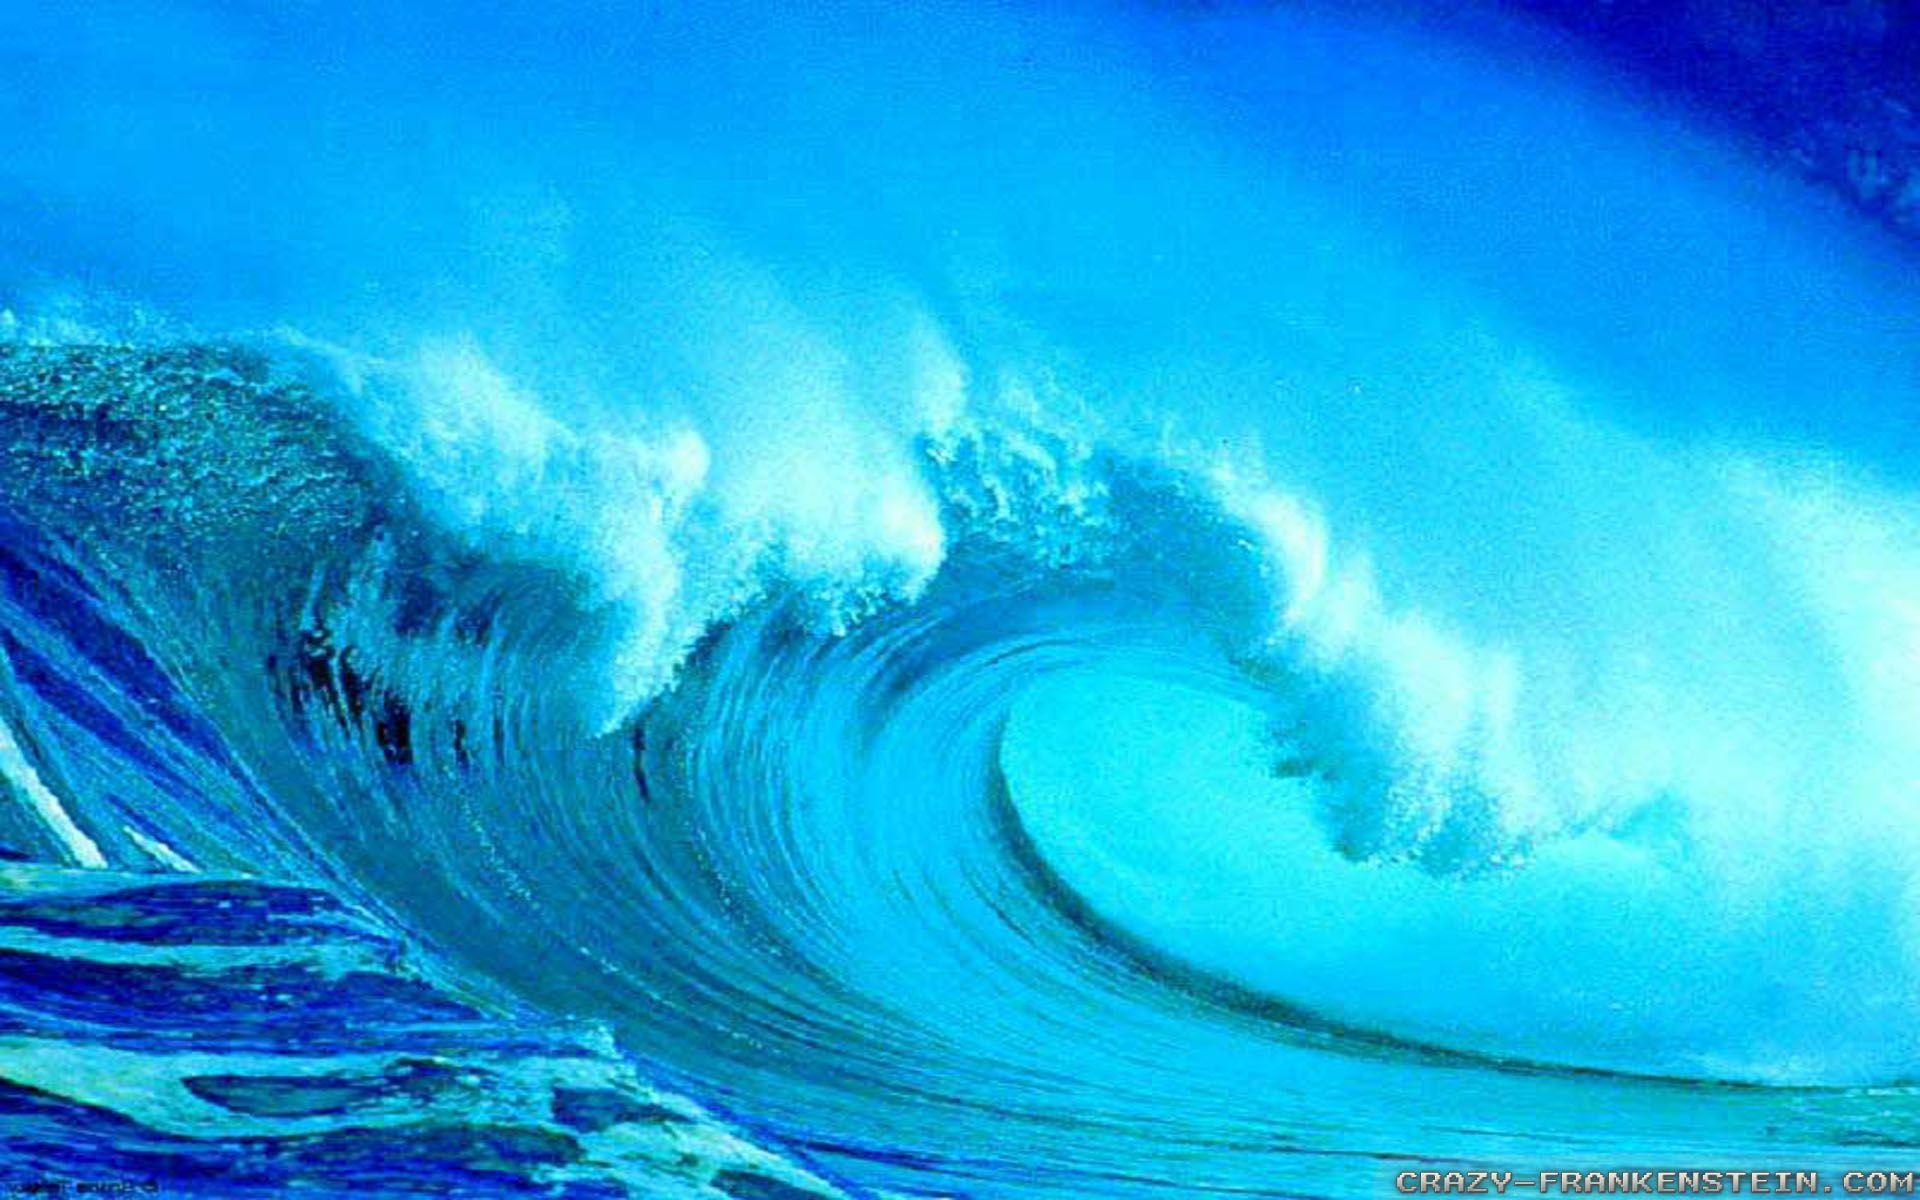 HD Wallpapers Ocean Wave Images For Desktop, Free